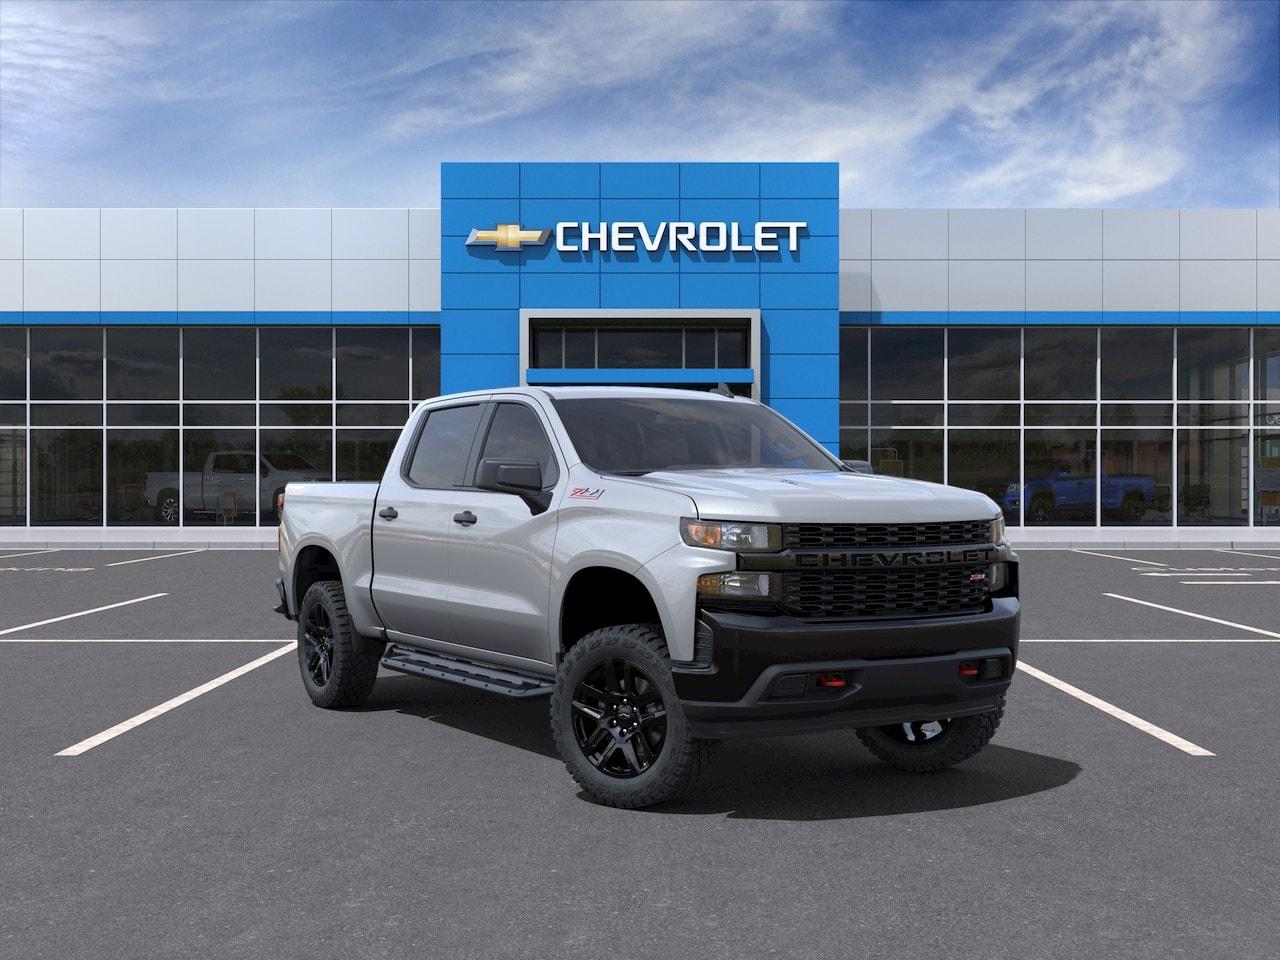 2021 Chevrolet Silverado Triadelphia WV